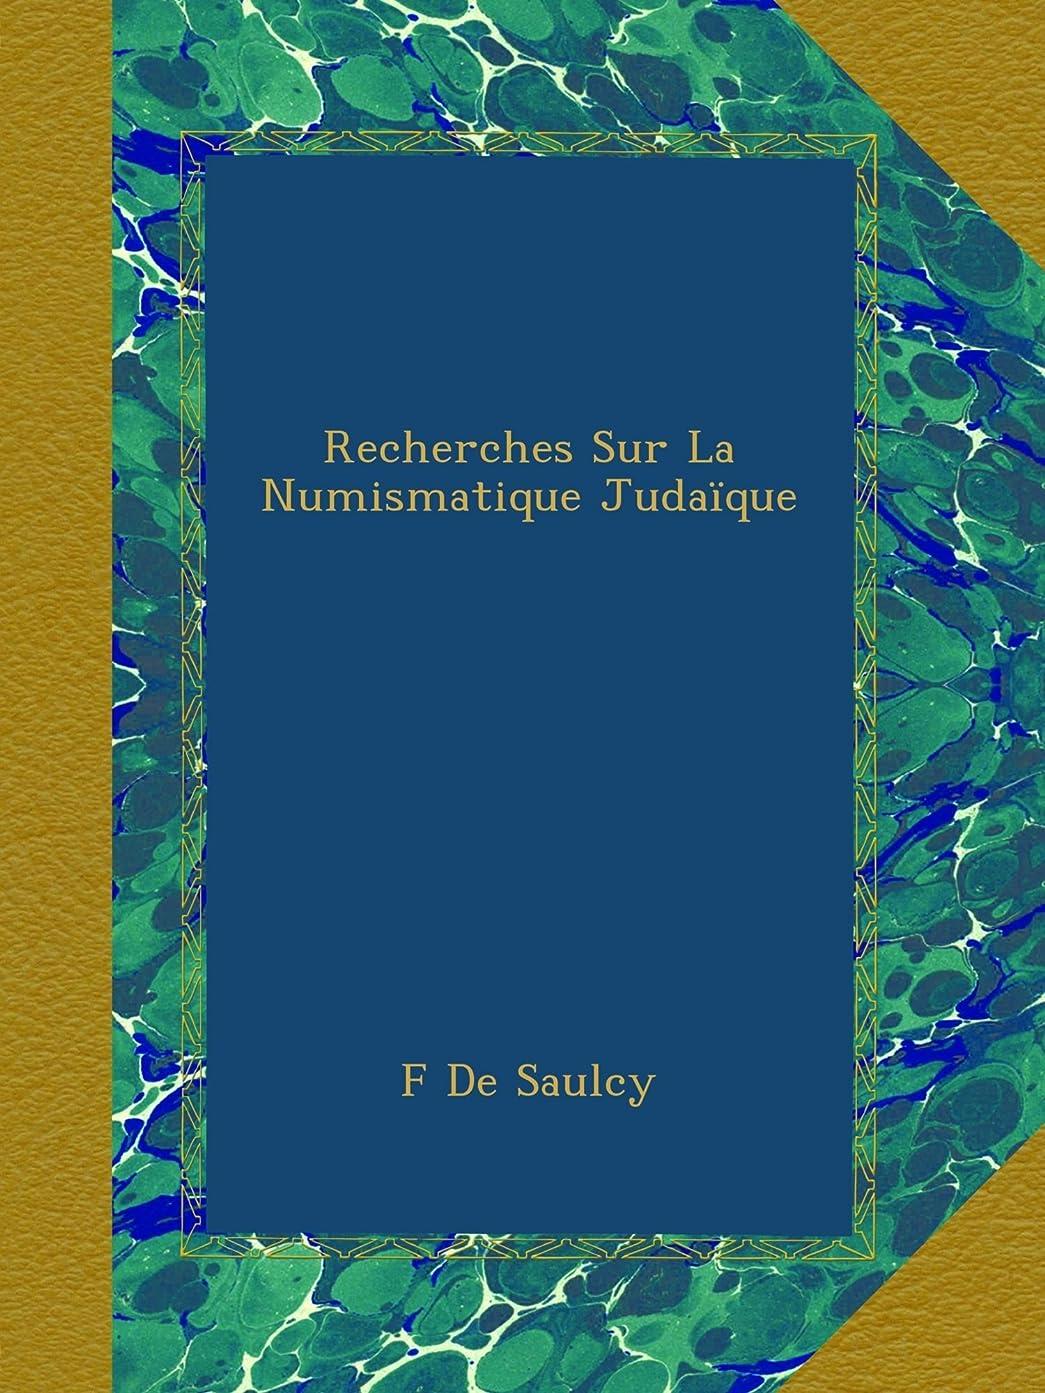 気候ポスター競合他社選手Recherches Sur La Numismatique Juda?que